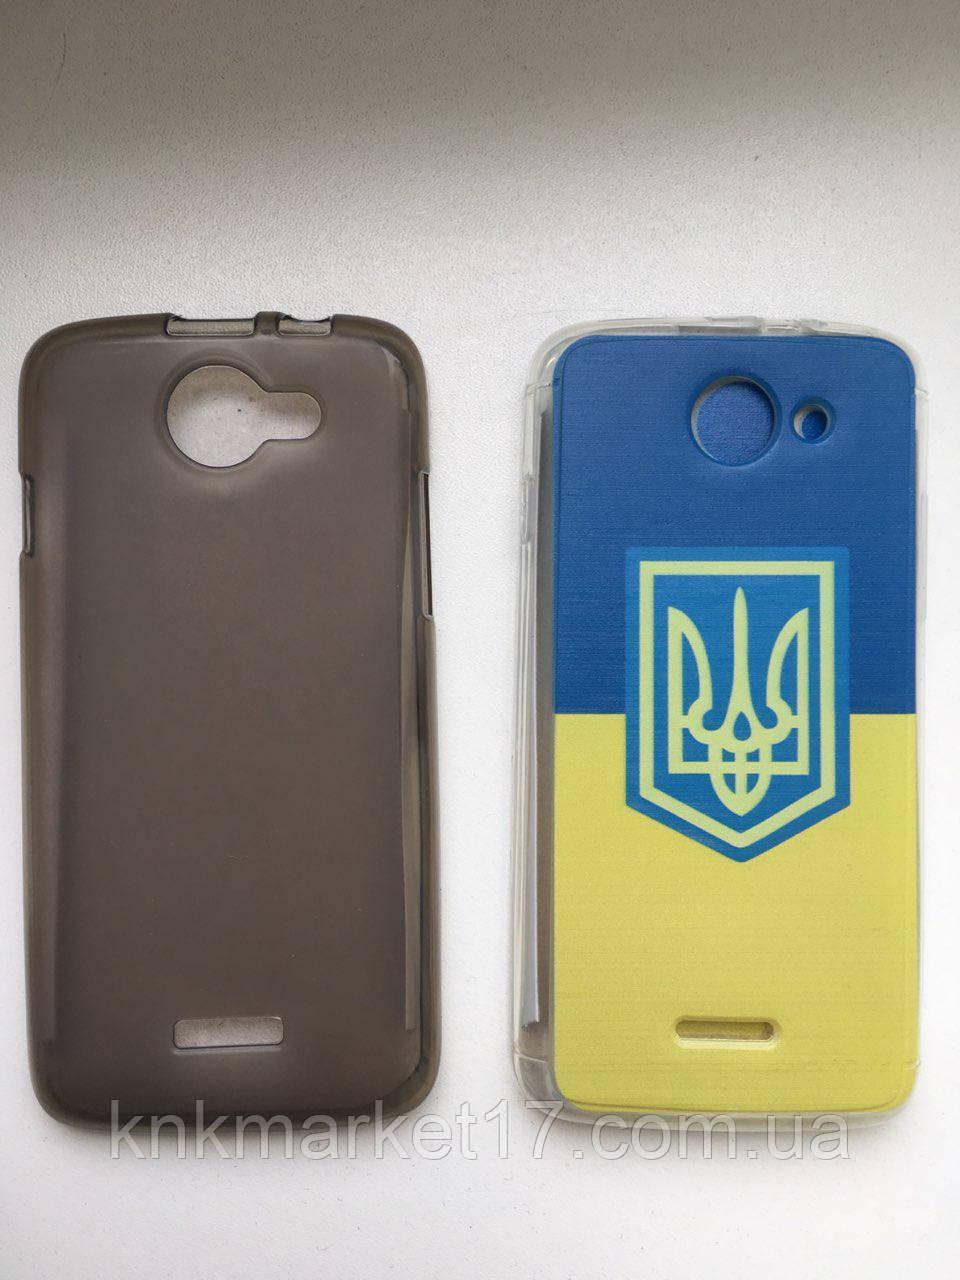 Накладка для Lenovo А670Т Силікон Сіра\Український дизайн